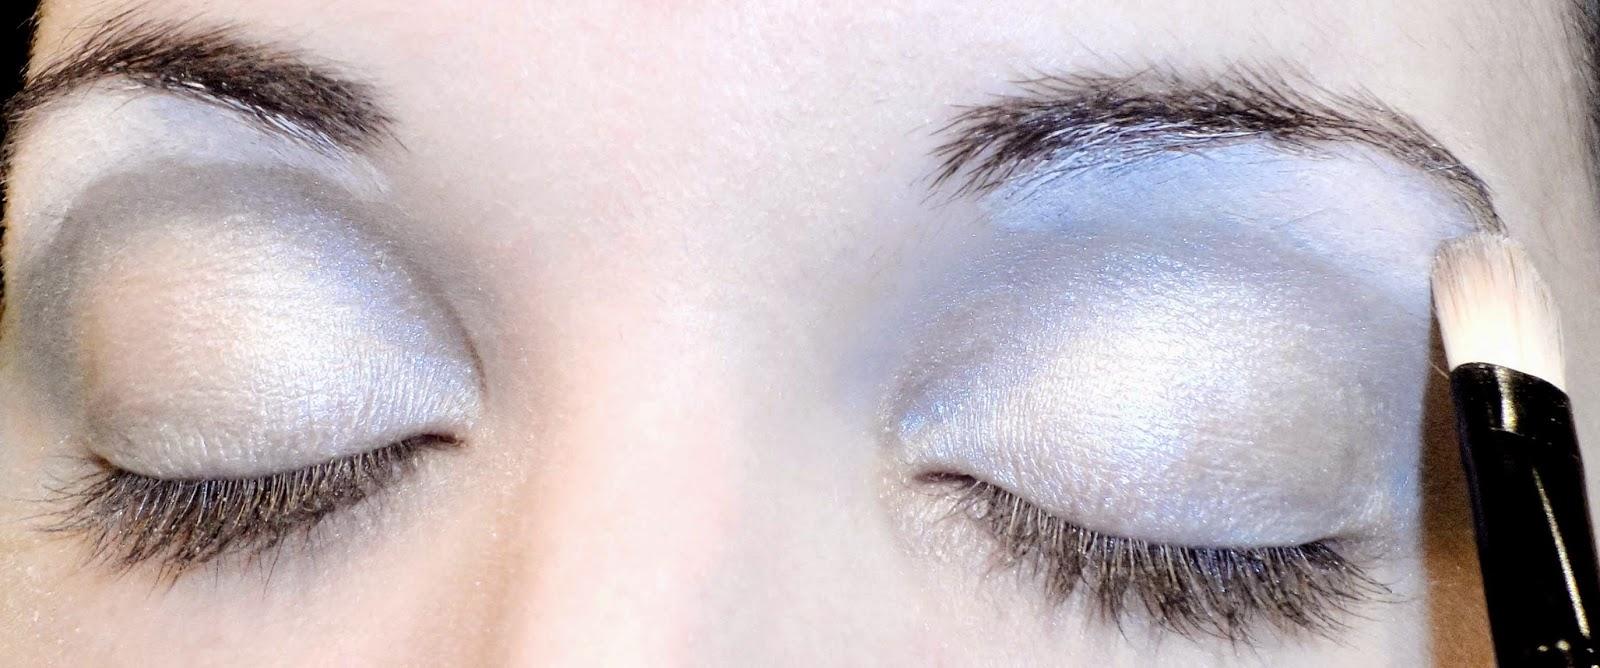 maquillaje para agrandar ojos paso a paso 3